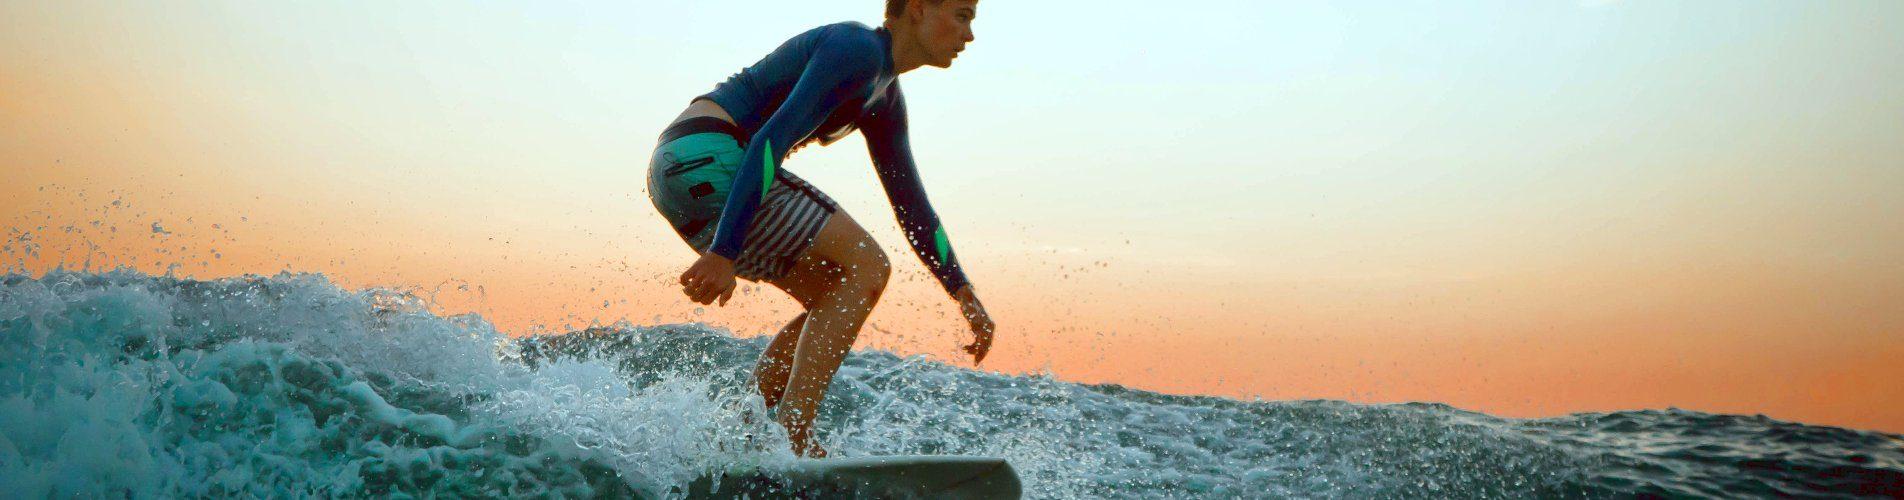 Junior Surfer lernen praxis